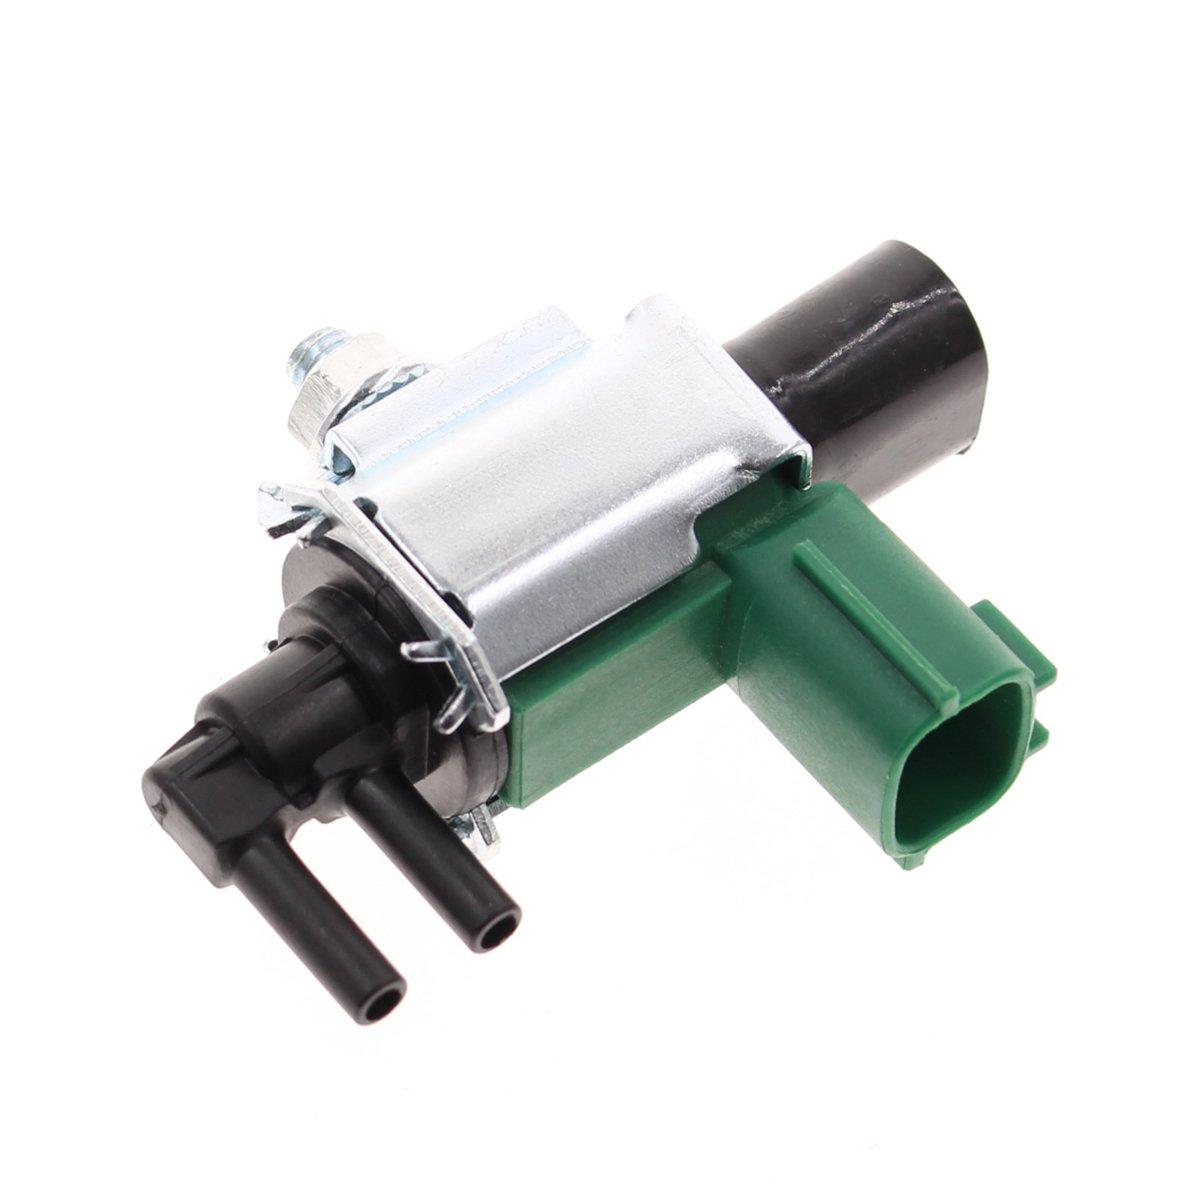 Goodeal Vacuum Valve Egr Control Solenoid Switch For 2002 Nissan Xterra Suspension Altima Maxima Quest Sentra Automotive